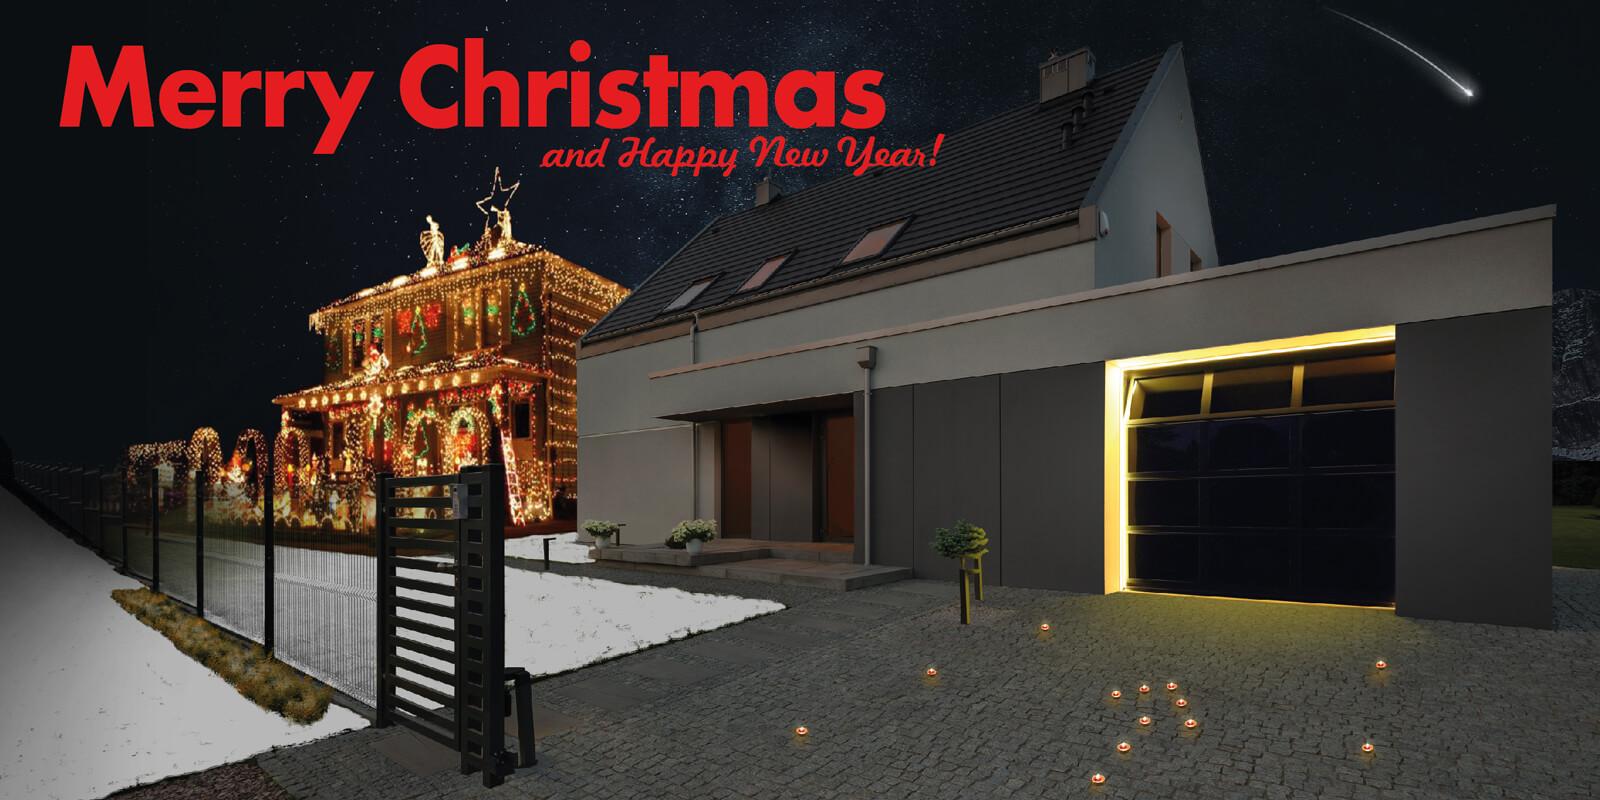 Santa stop here! It's a Breda Christmas house, Merry Christmas!